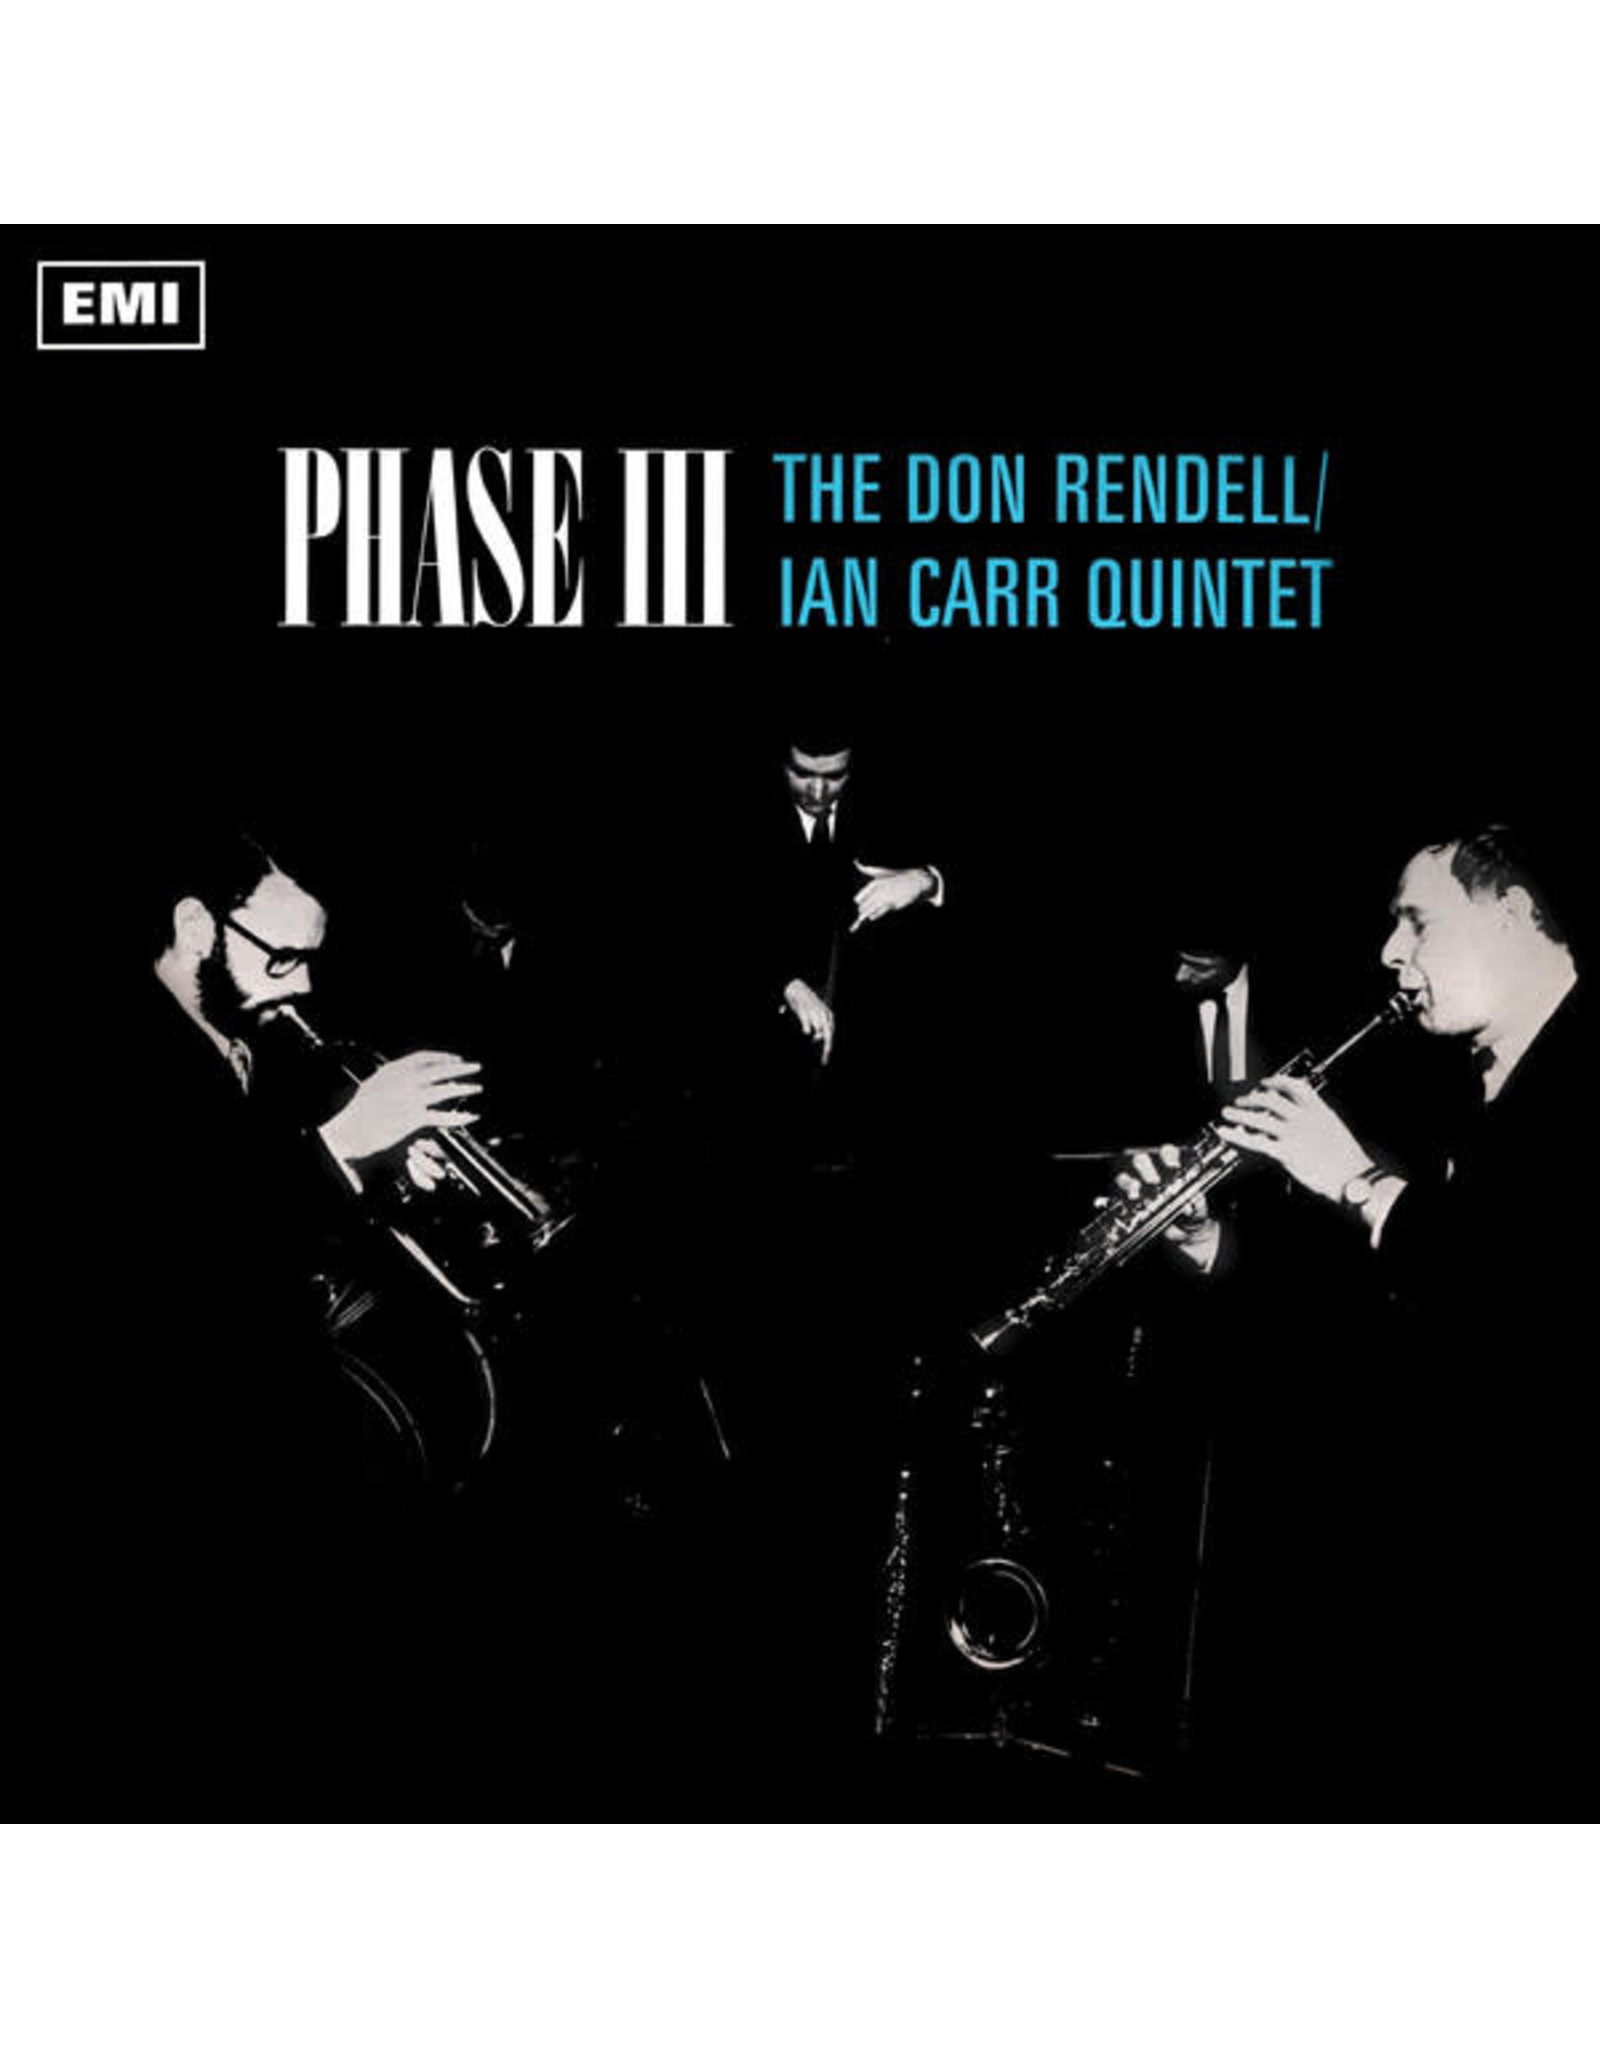 New Vinyl The Don Rendell / Ian Carr Quintet - Phase III LP